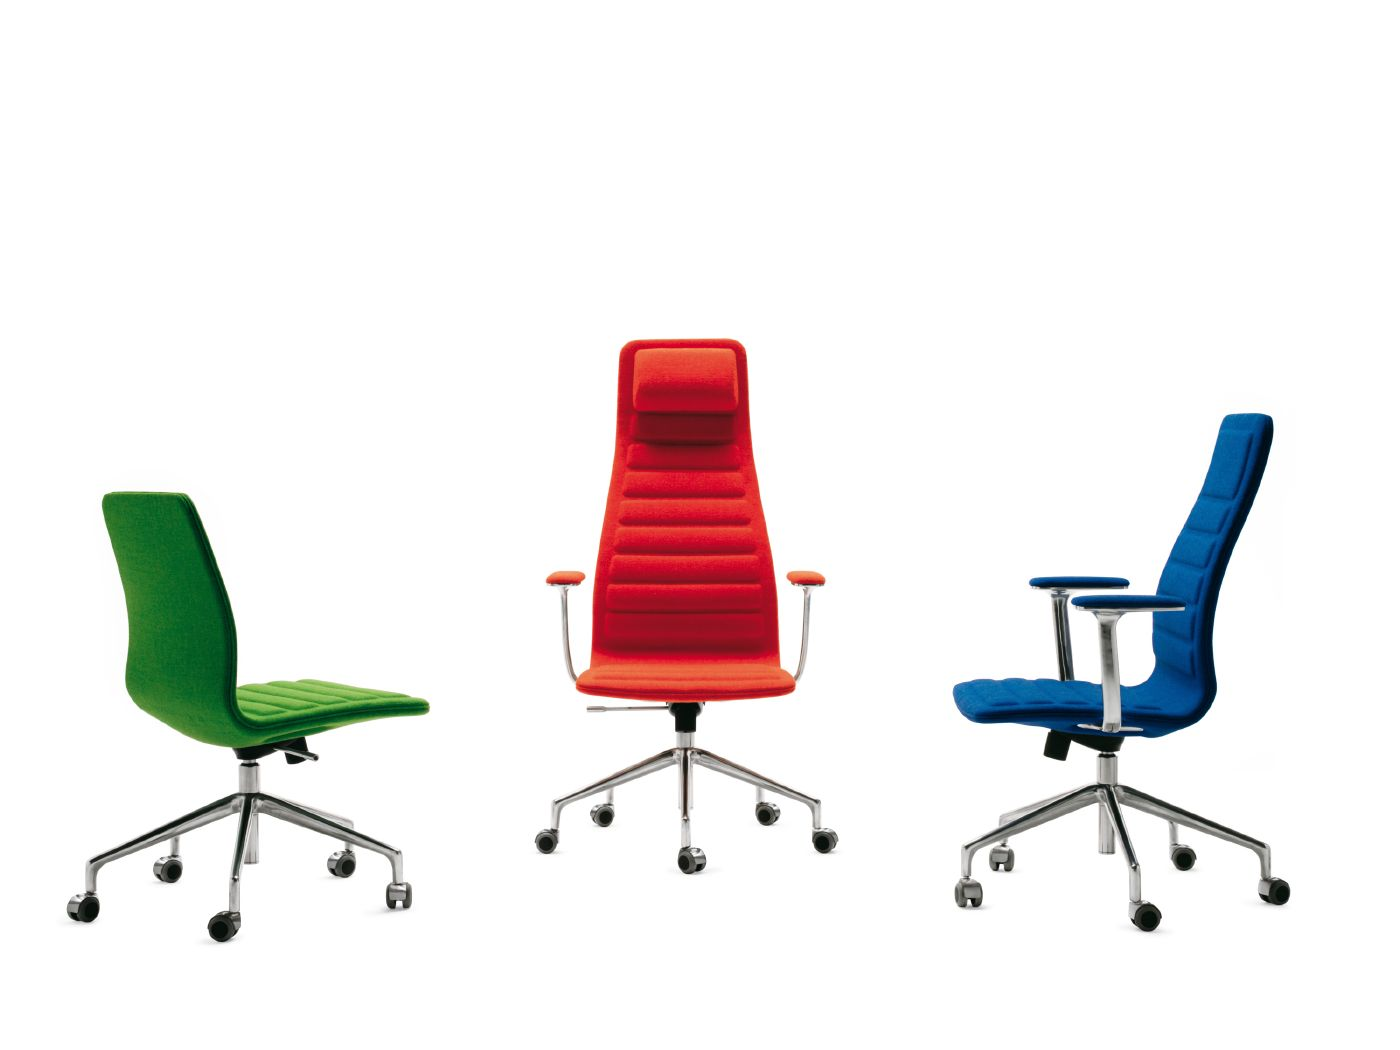 Lotus Chairs